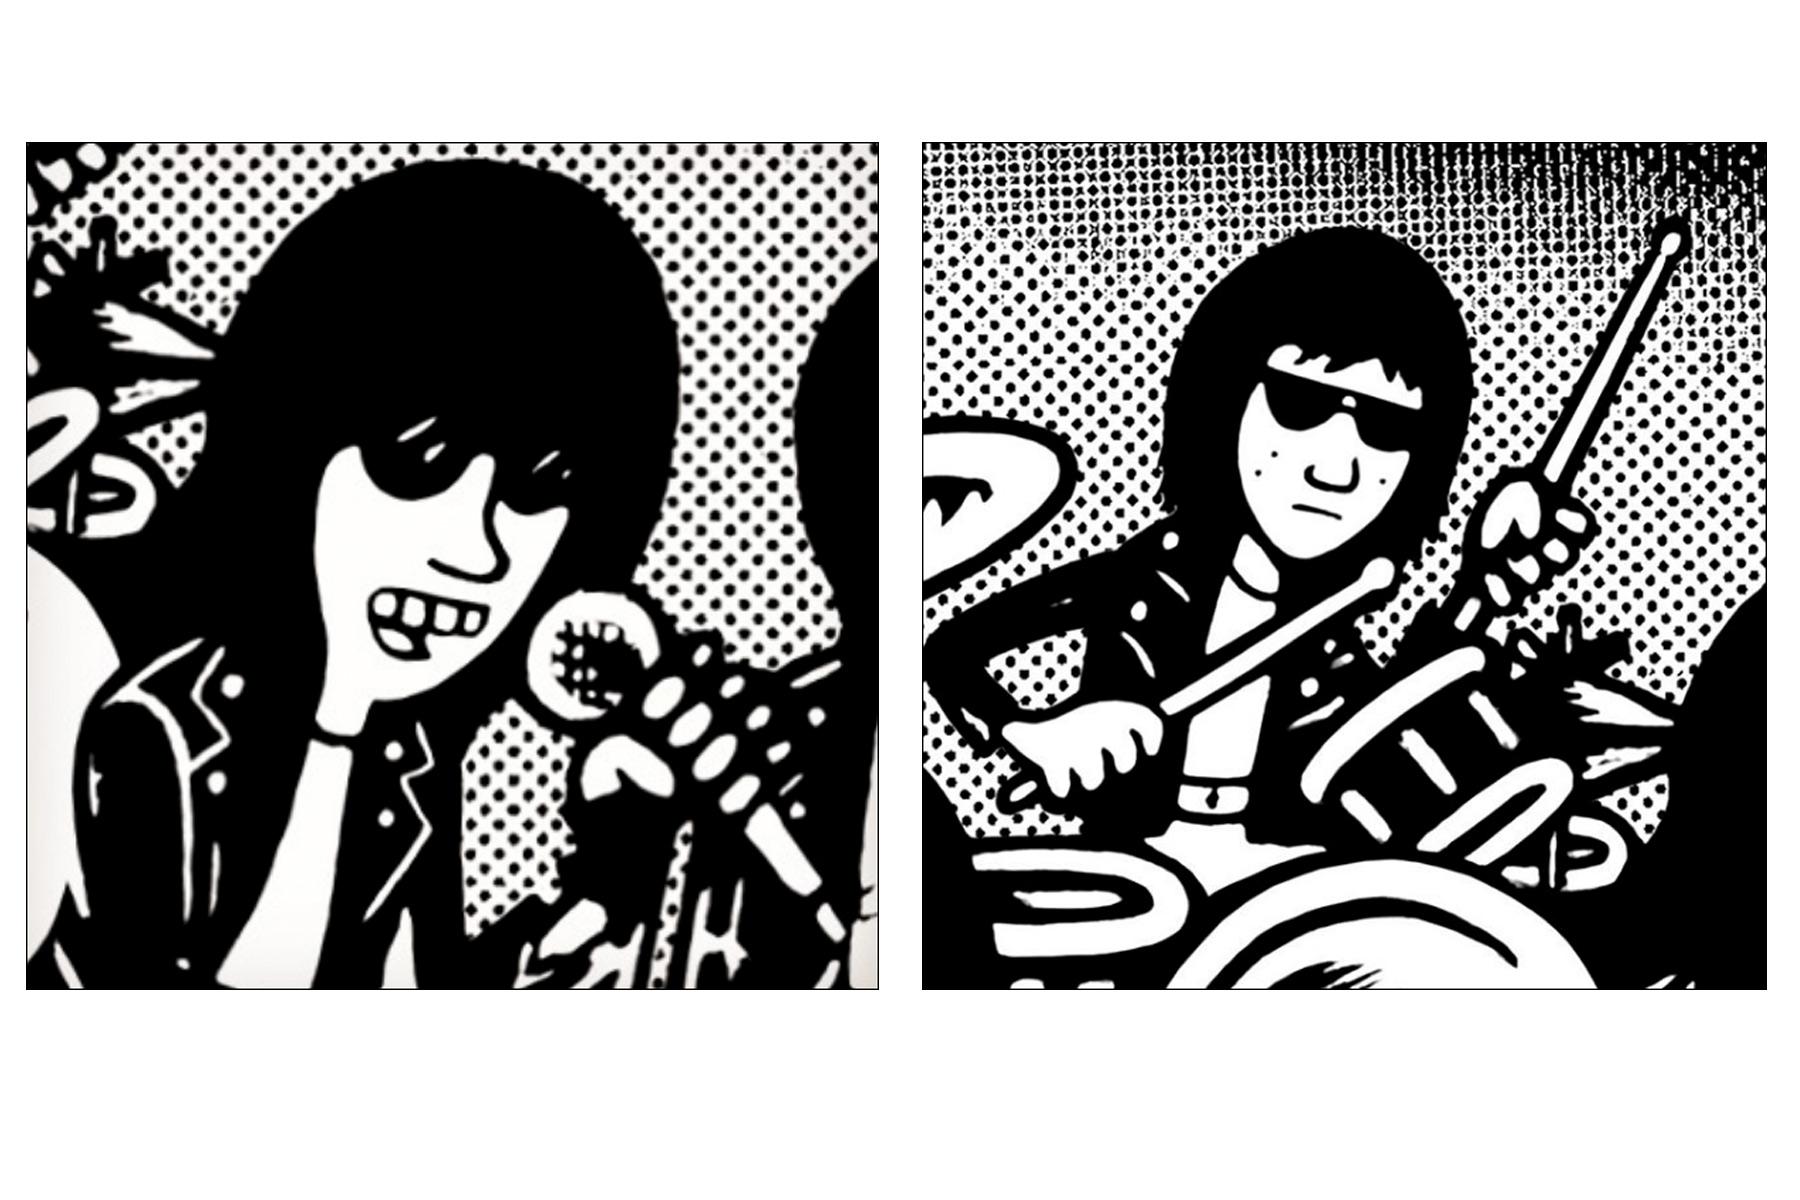 Ramones drawings by artist Avi Spivak. Ponyboy magazine.